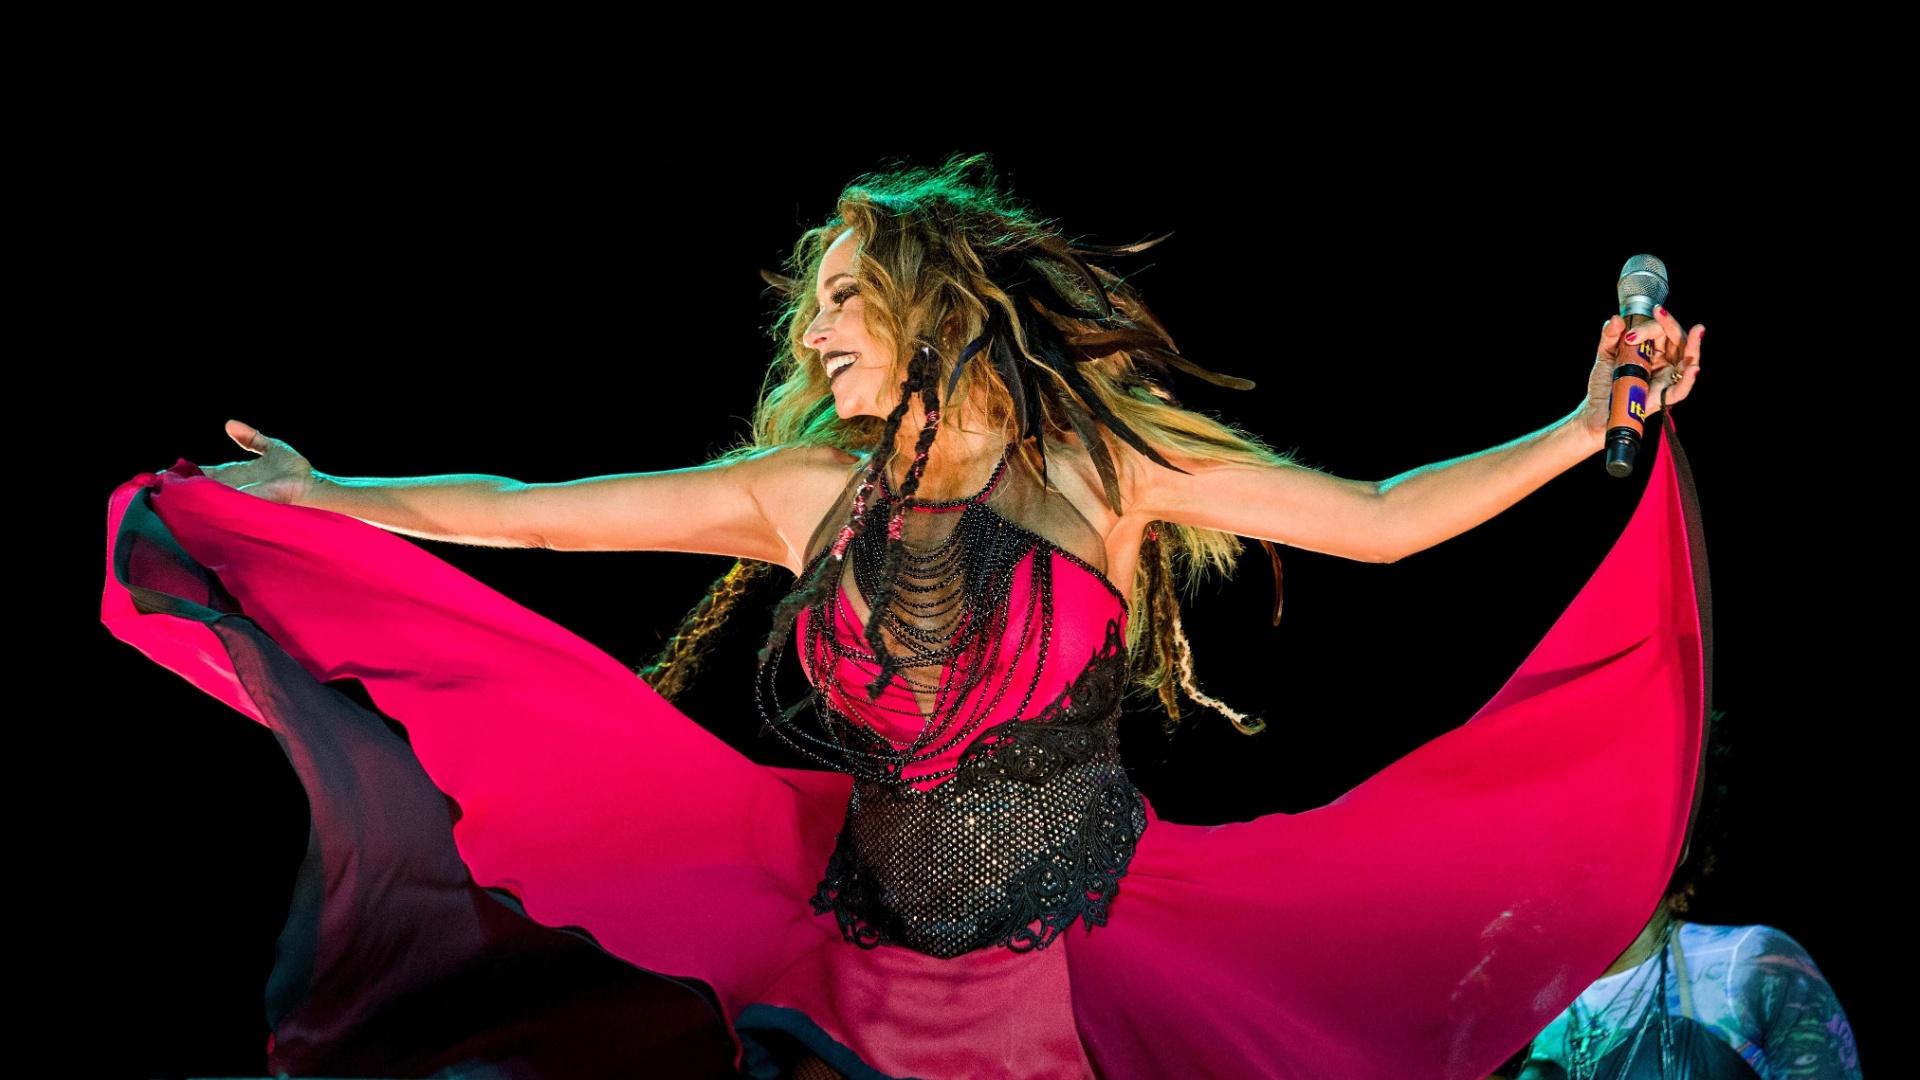 Musa do Carnaval baiano, Daniela Mercury apresenta o Baile da Rainha Má